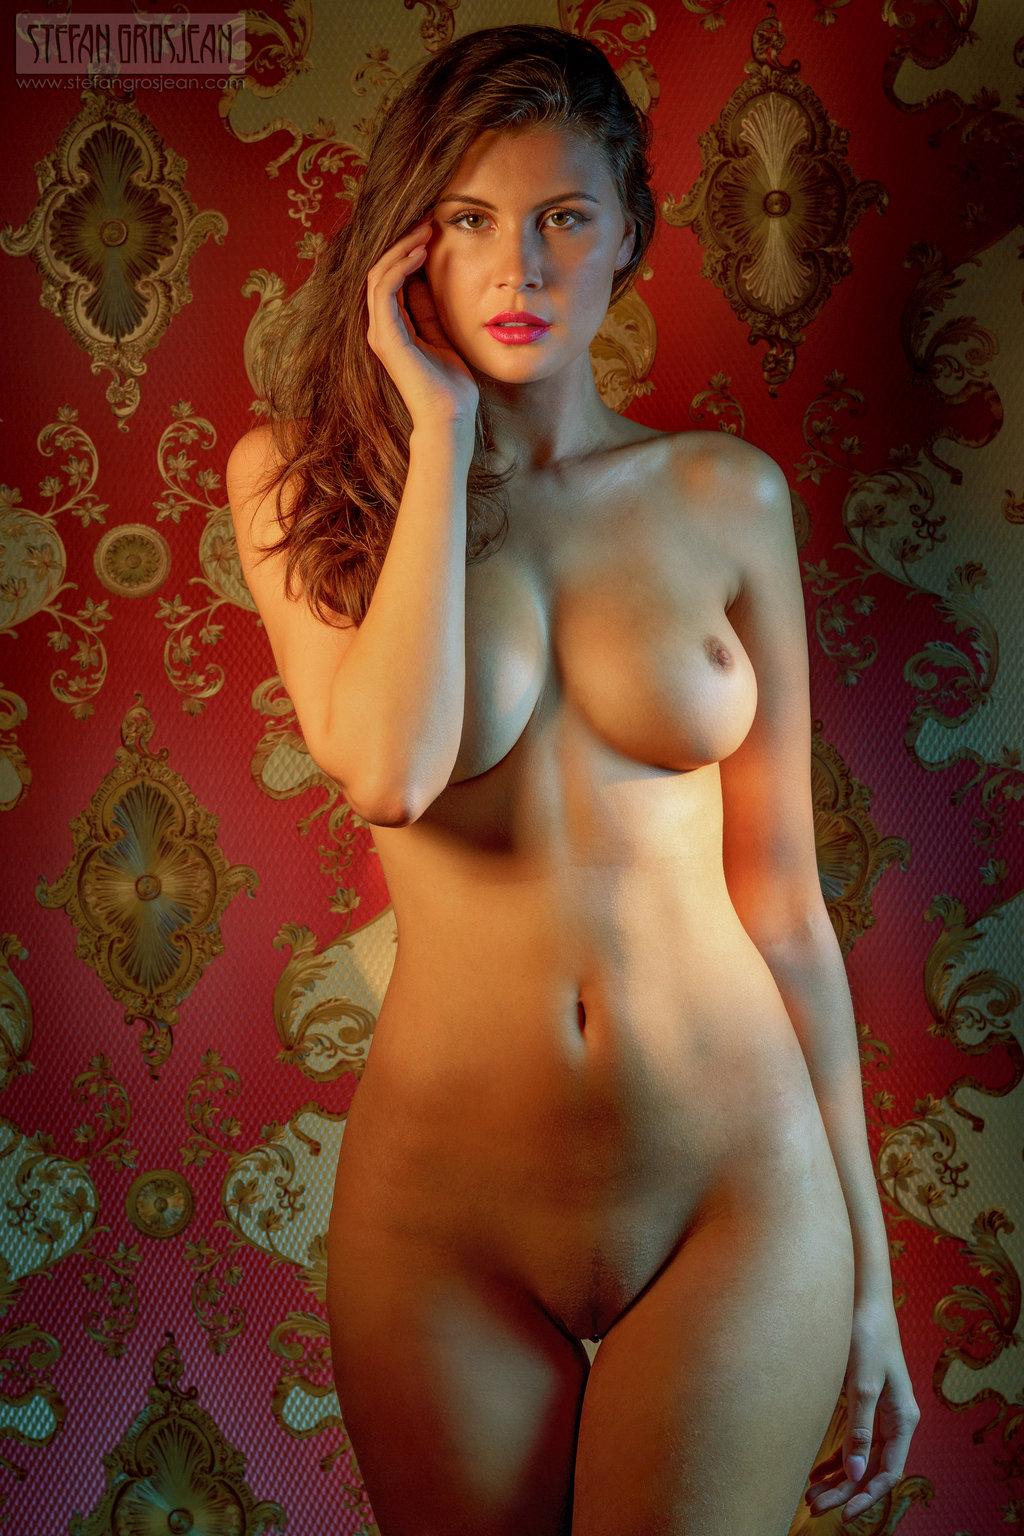 Madame Voyeur - three hot new pics every day